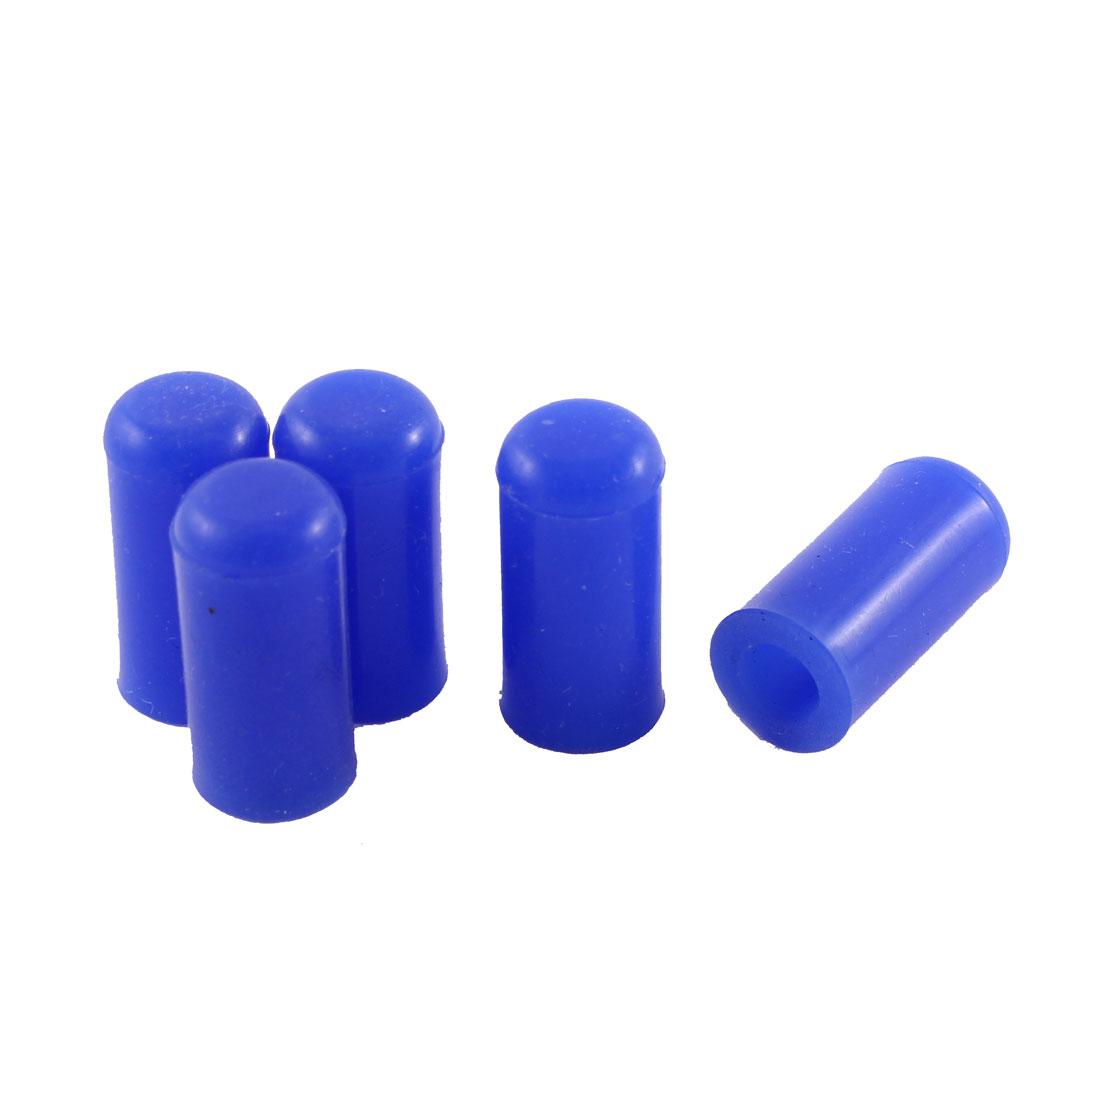 "Blue 6mm 1/4"" Silicone Blanking Cap Intake Vacuum Hose End Bung 5pcs"